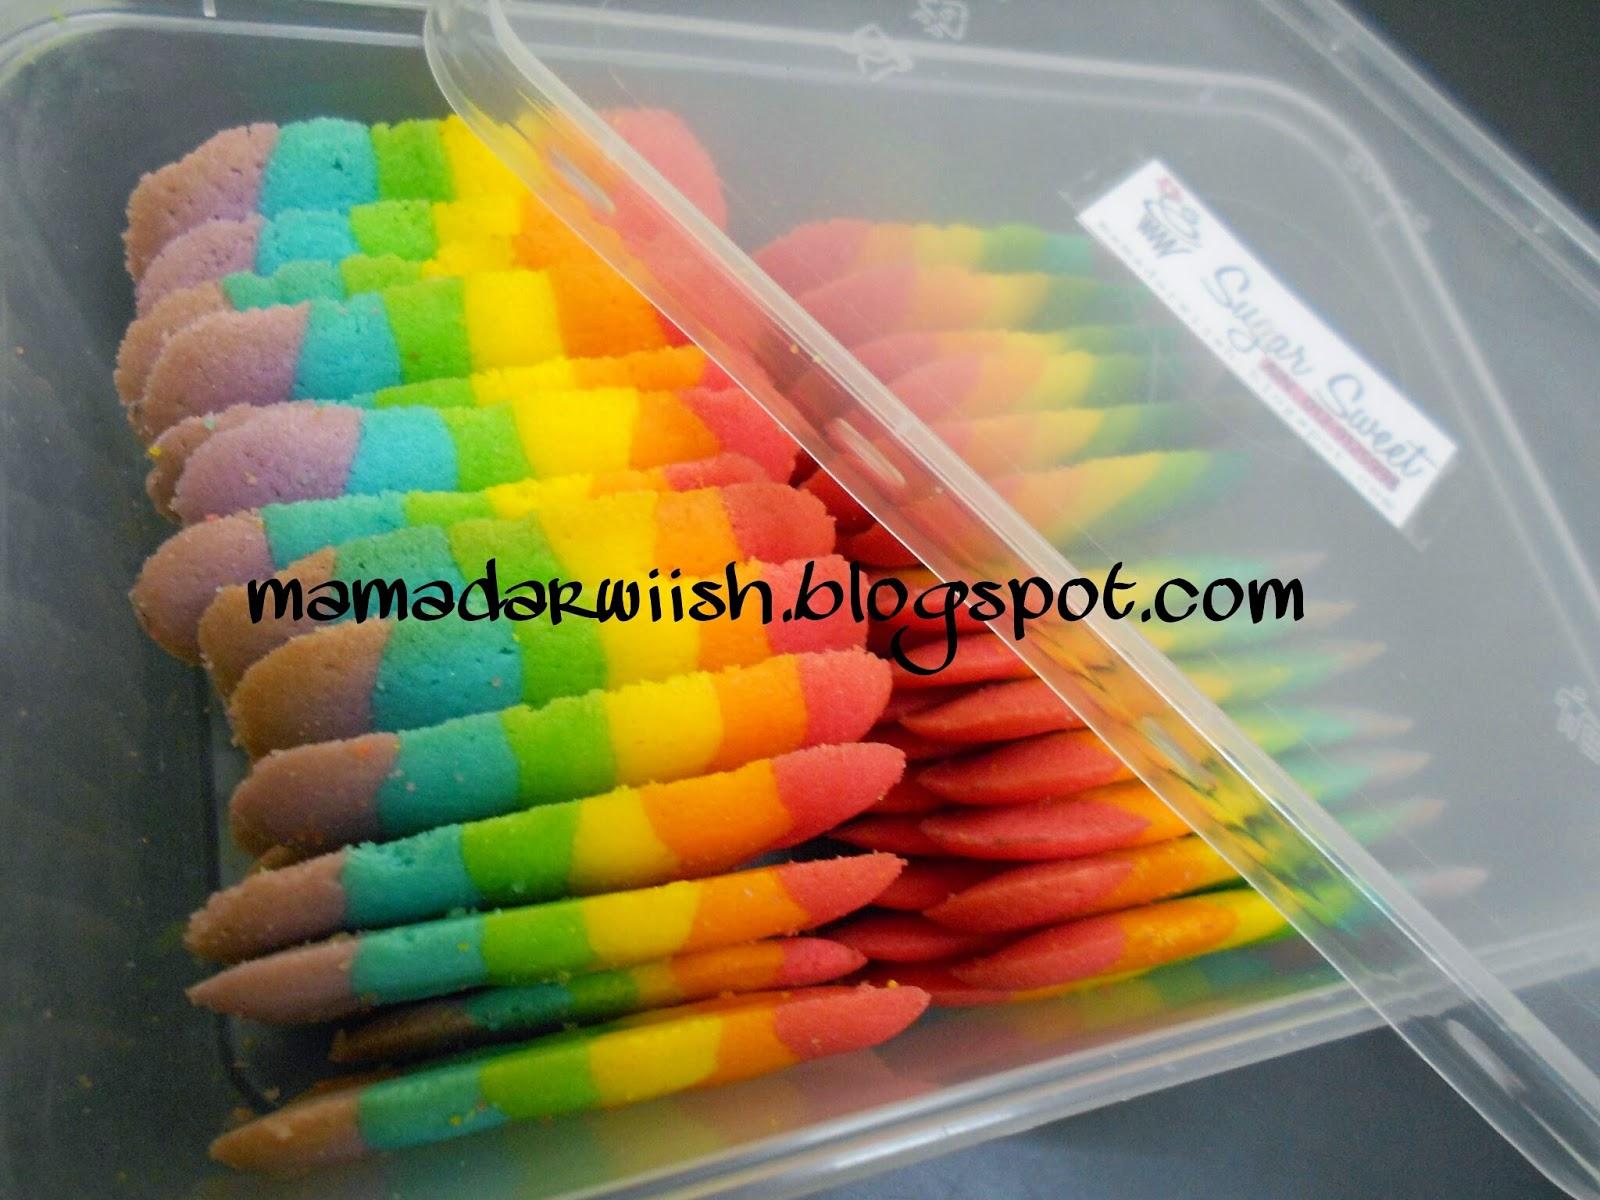 Resepi Biskut Lidah Kucing Rainbow Cookies Paling Sedap